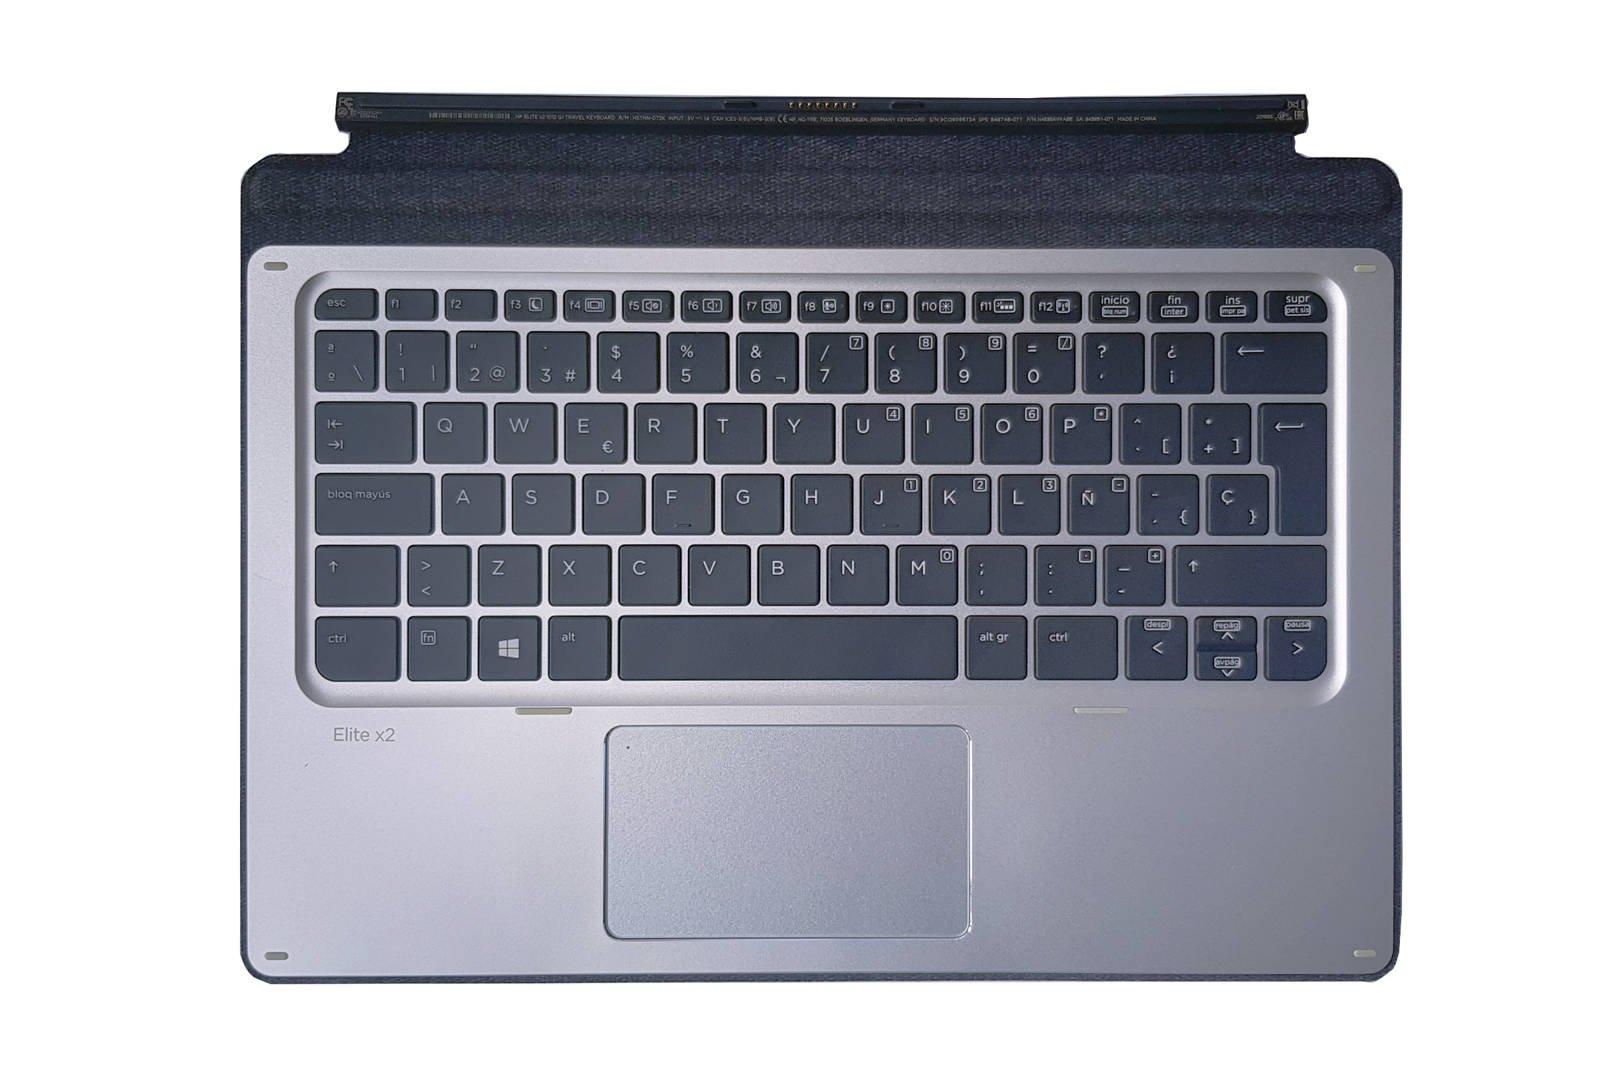 HP Elite x2 1012 G1 Travel Keyboard HSTNN-D72K Spain